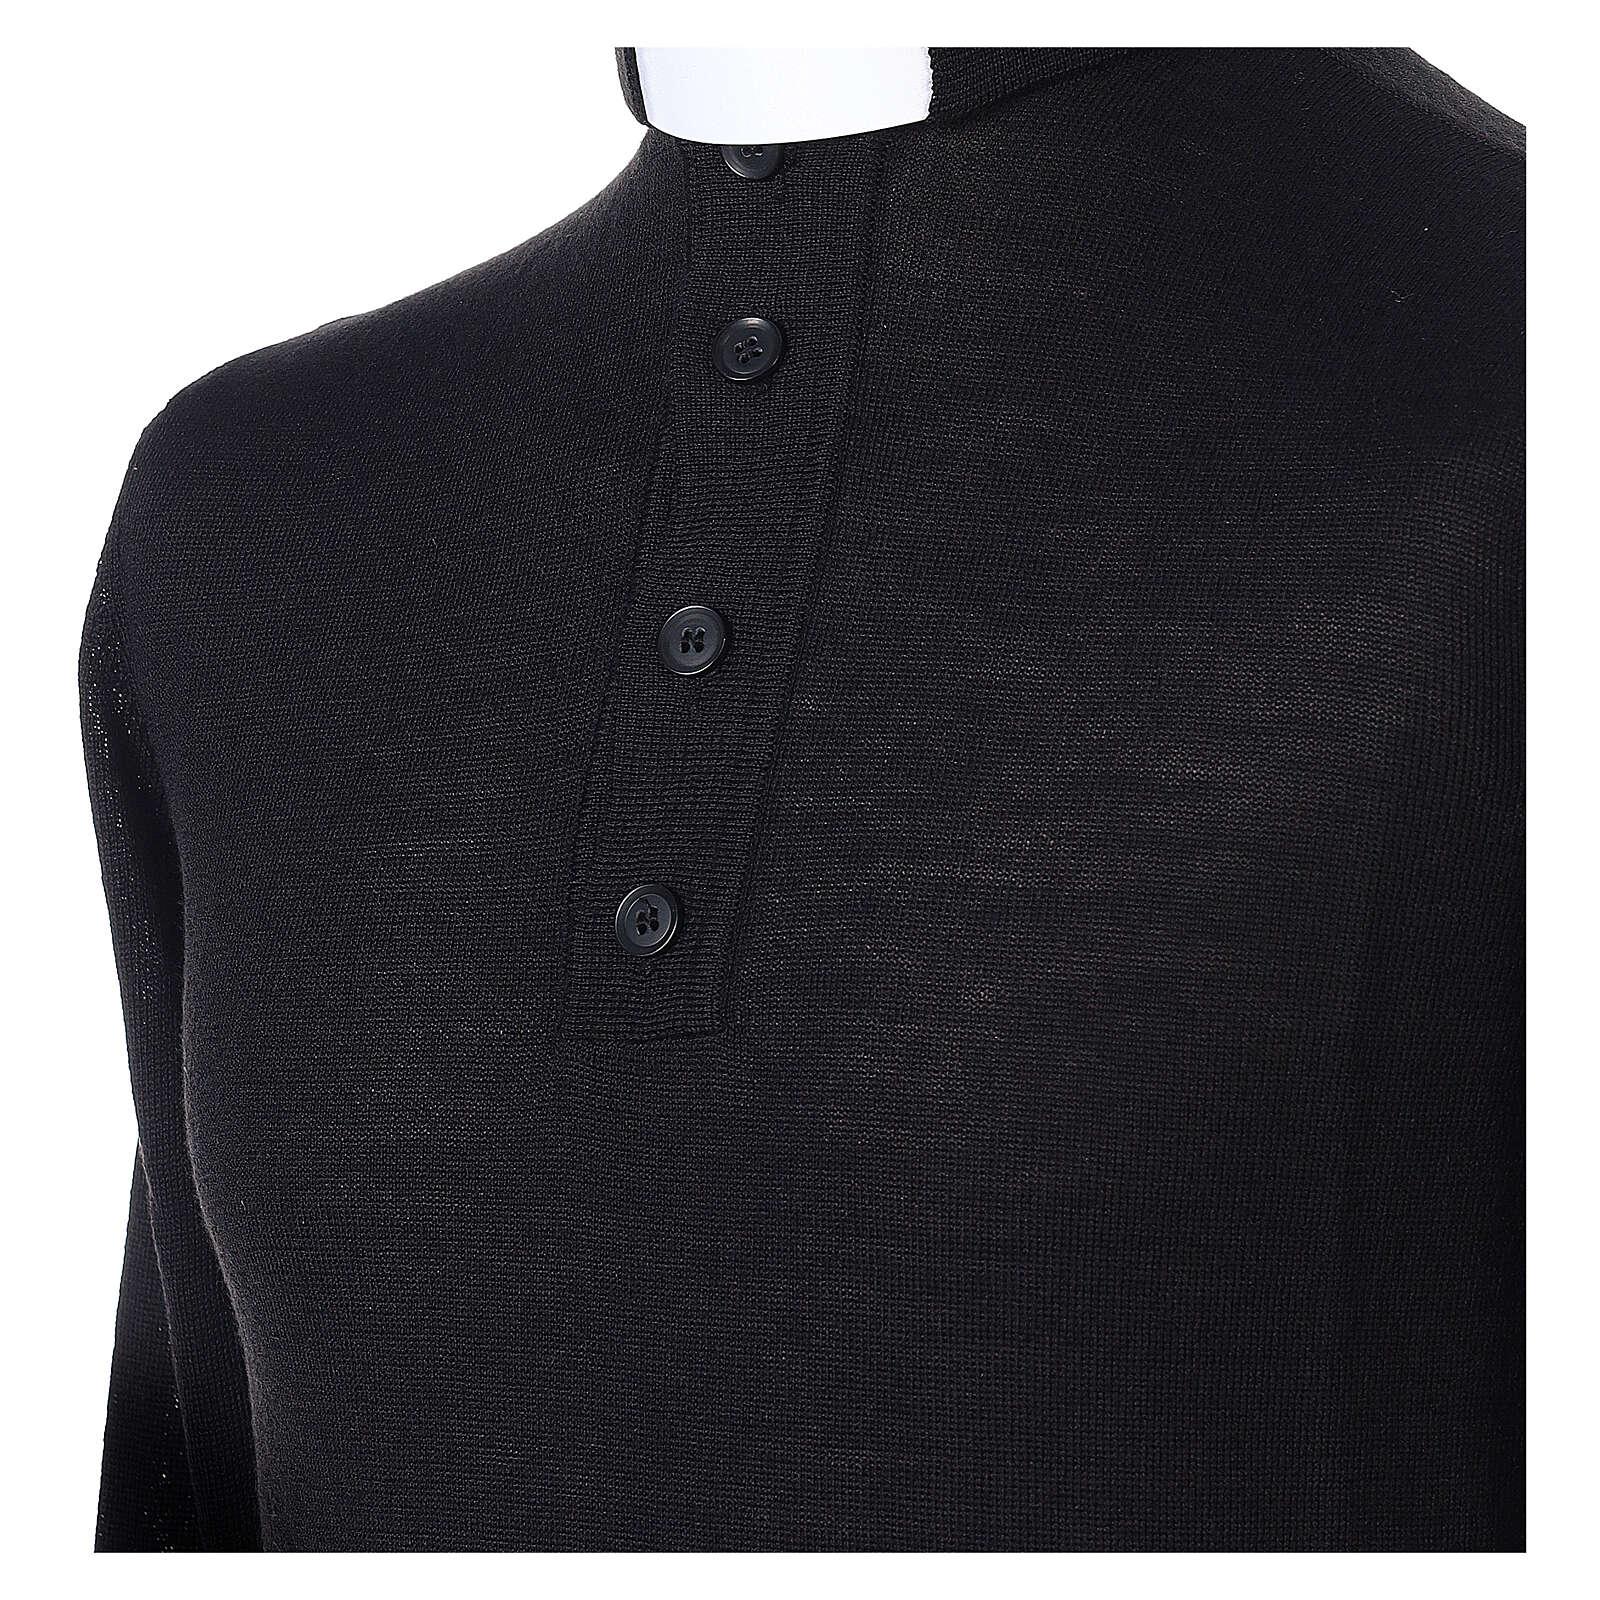 Jersey Merino cuello clergy negro 4